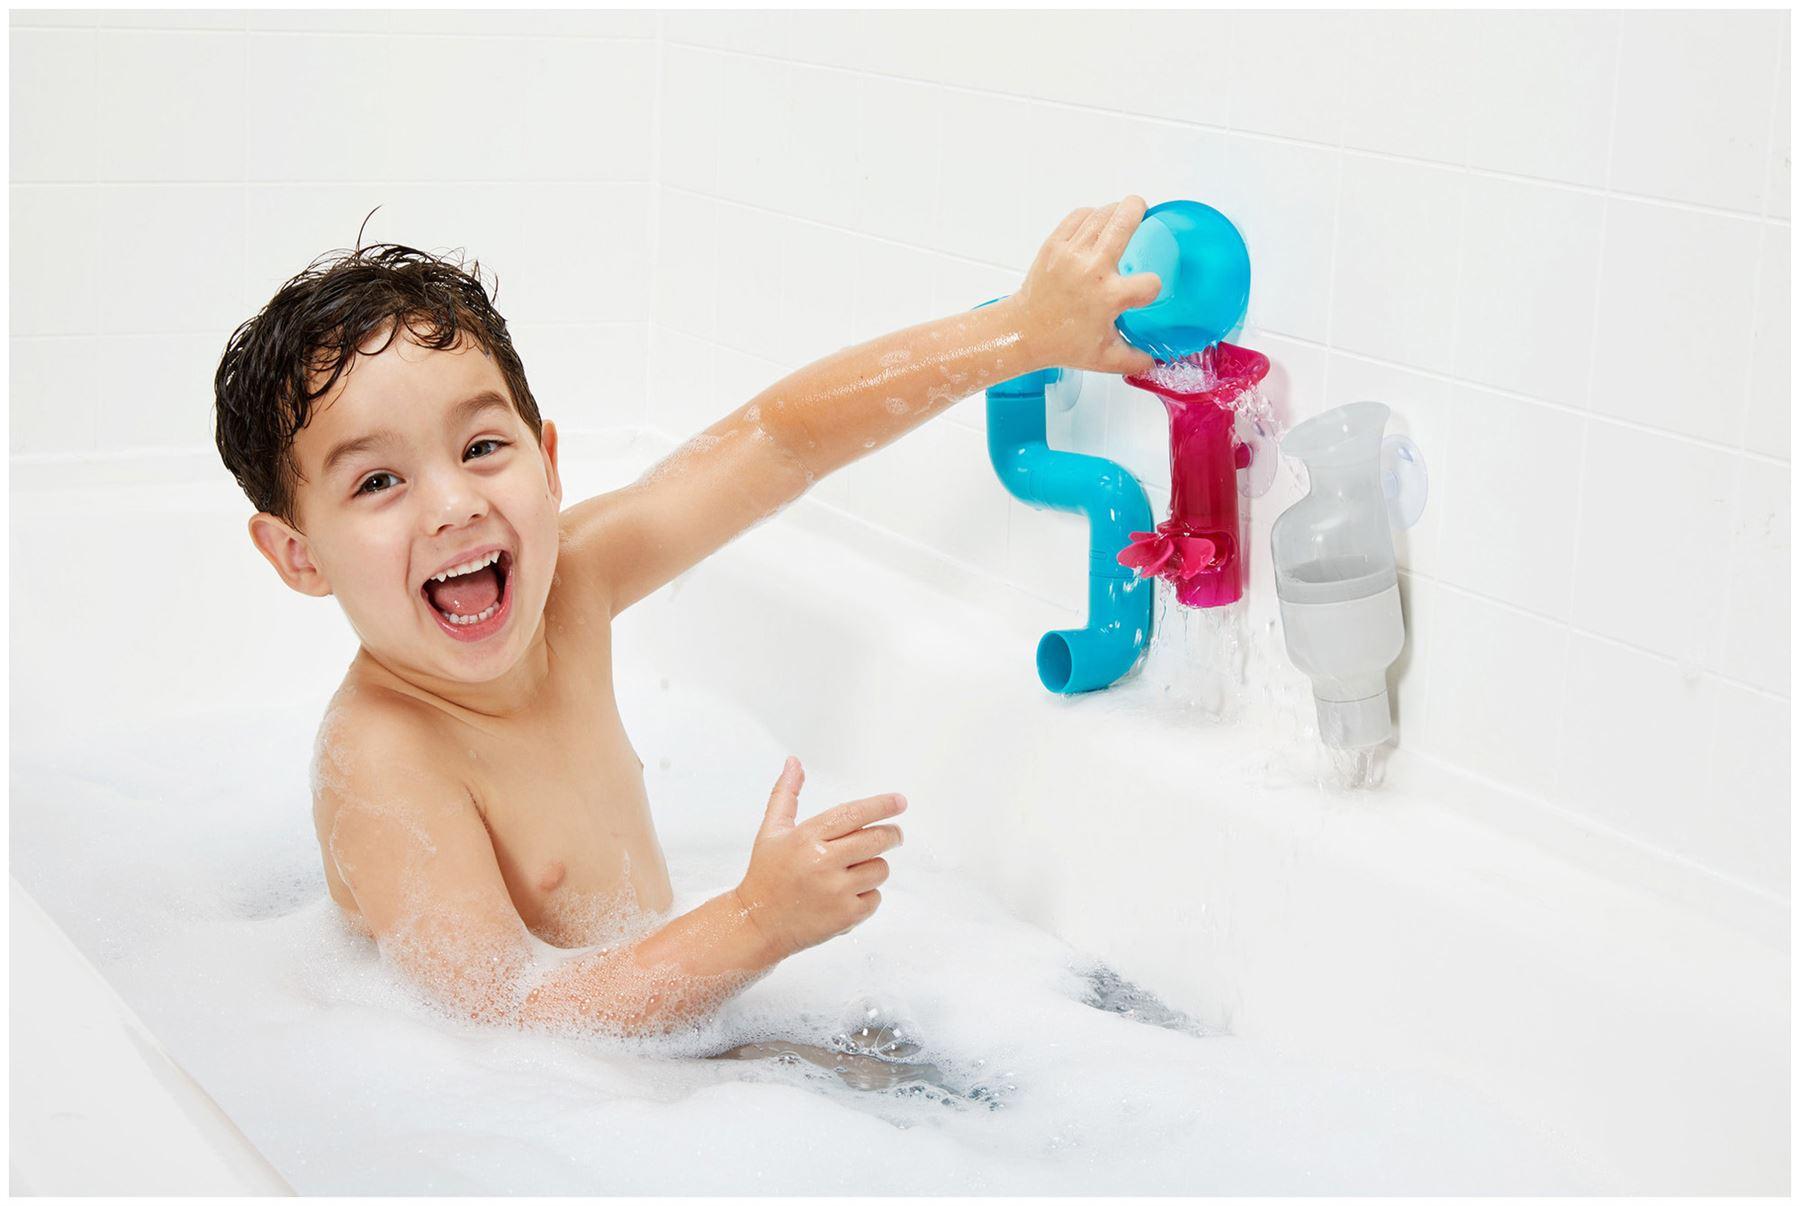 Boon TUBES WATER PIPE BATH TOY Baby Bath Toy BN 669028112074   eBay